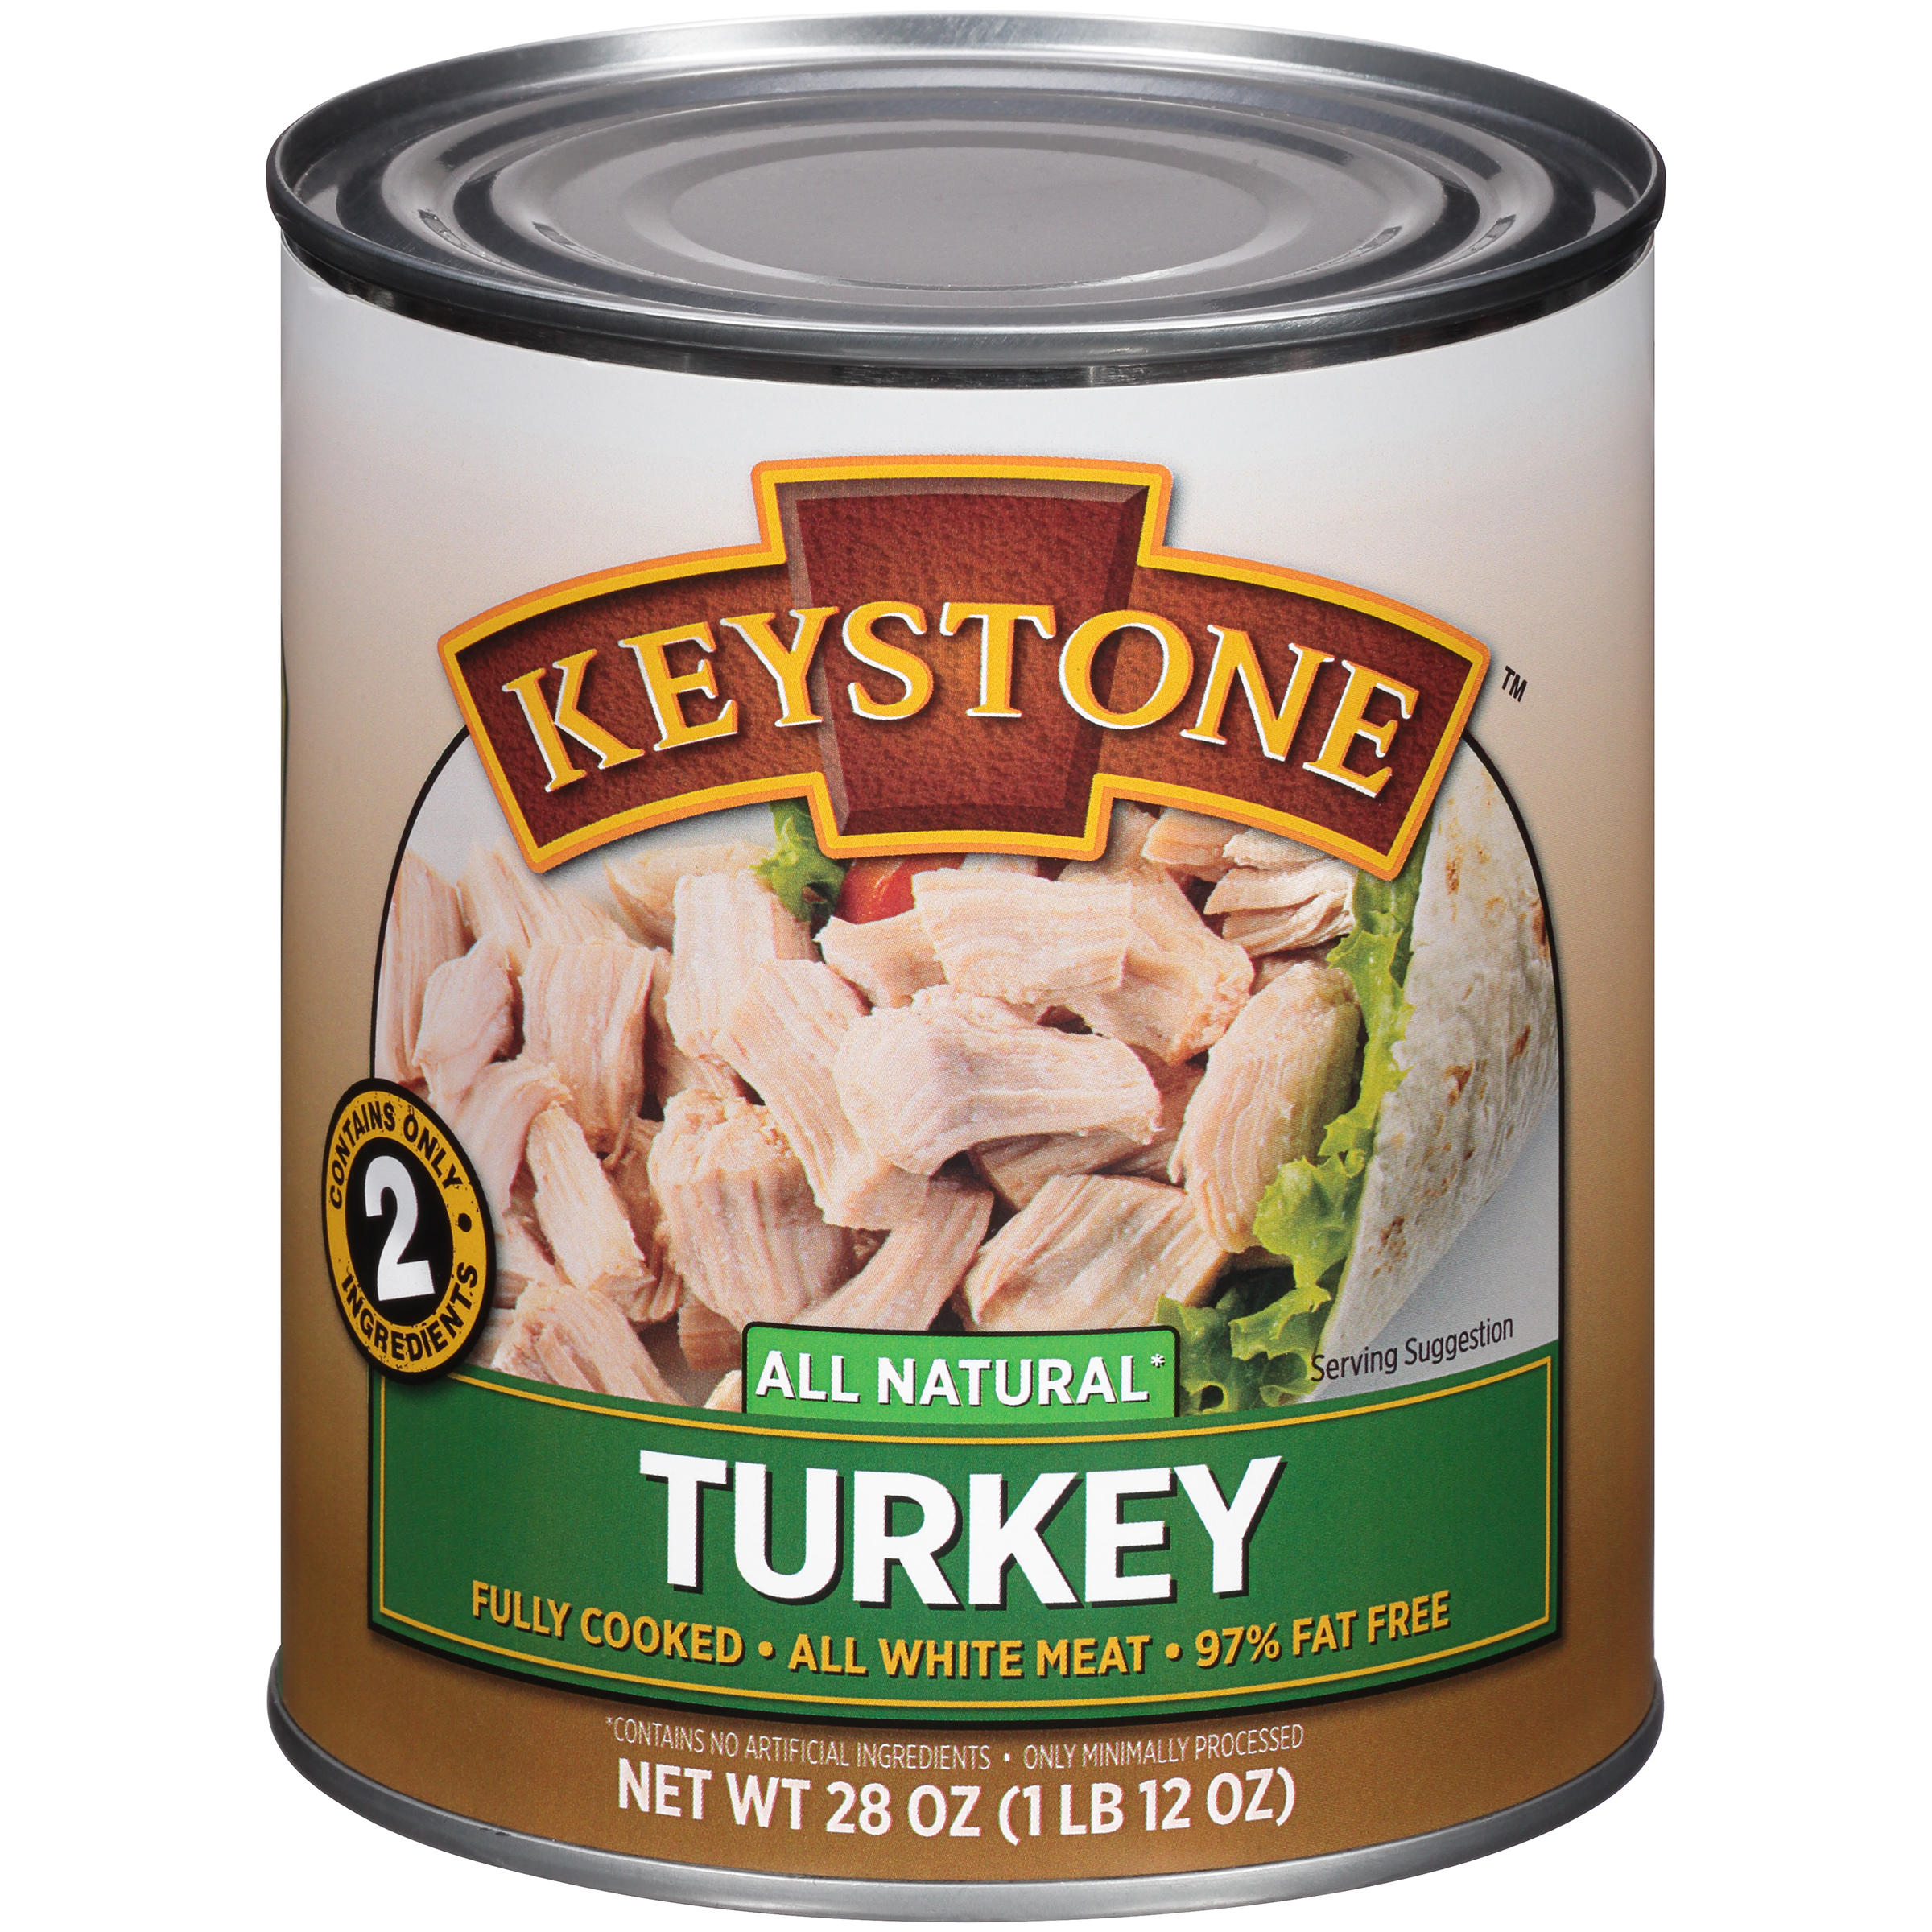 Keystone Turkey, 28 oz